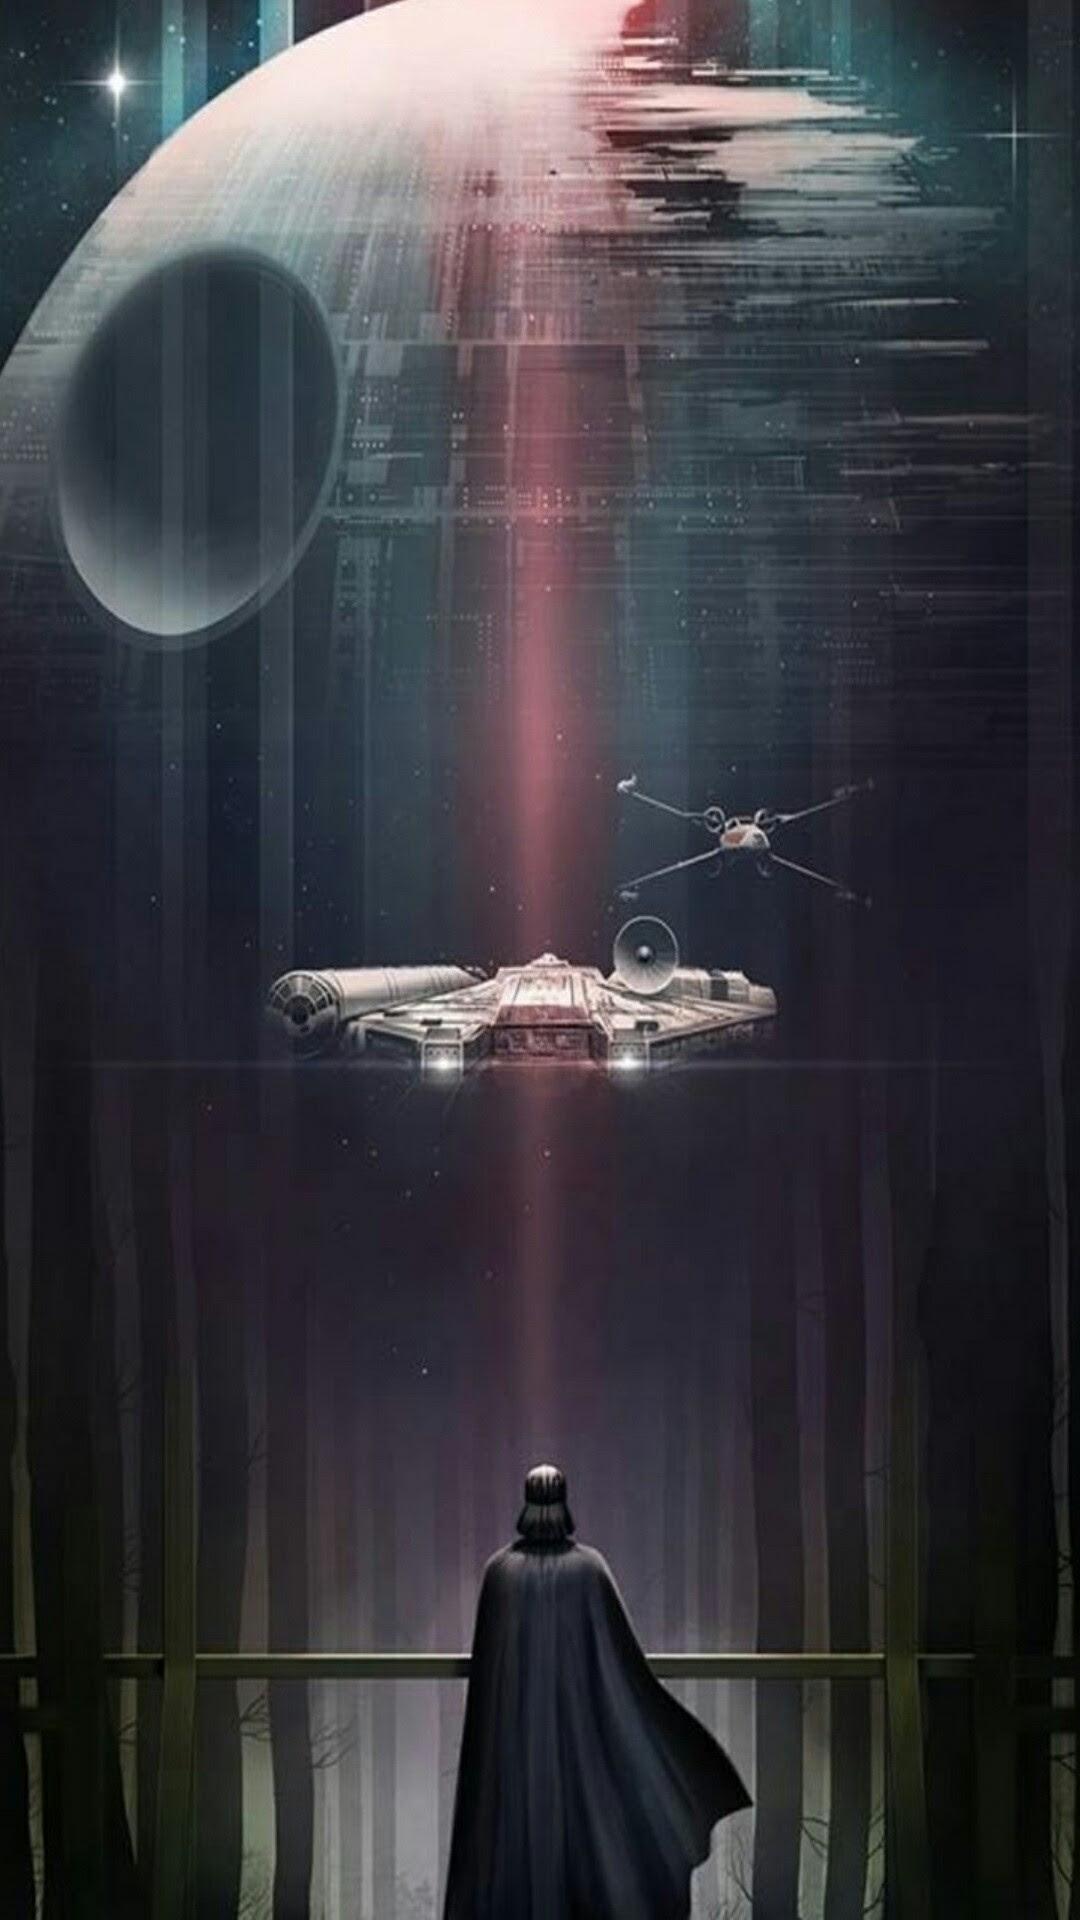 Jedi Order Star Wars Phone Wallpaper Glowing Symbol My Work